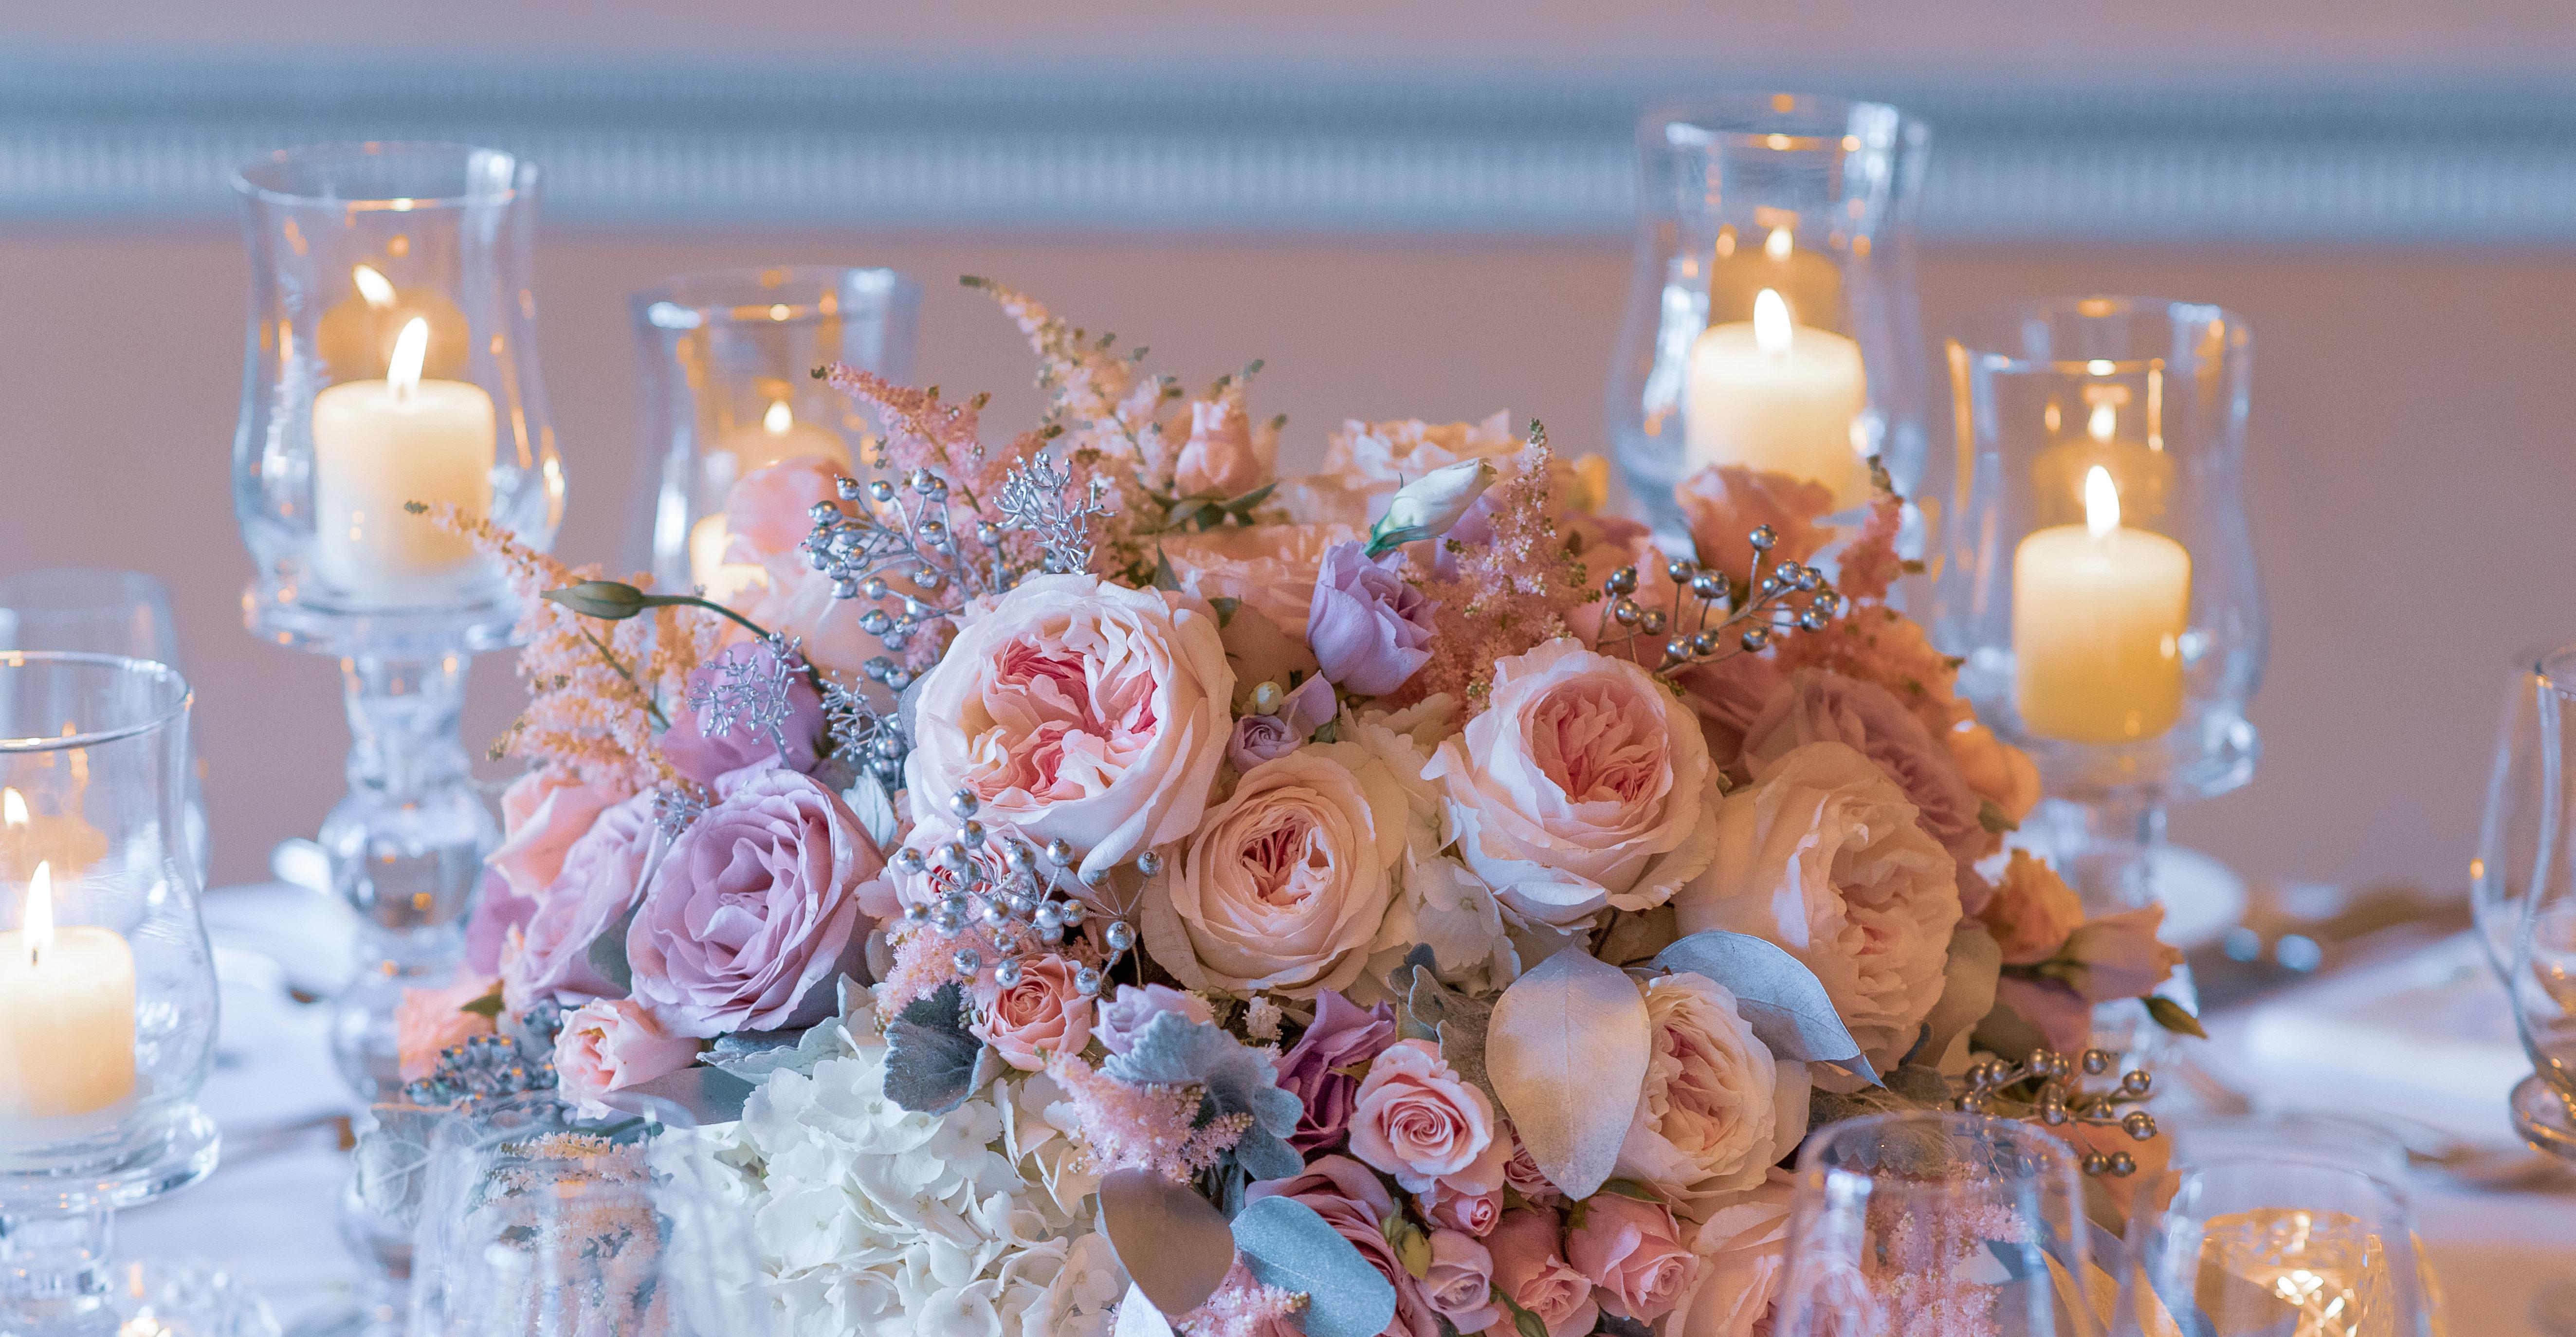 Mary jane vaughan award winning london wedding event florist izmirmasajfo